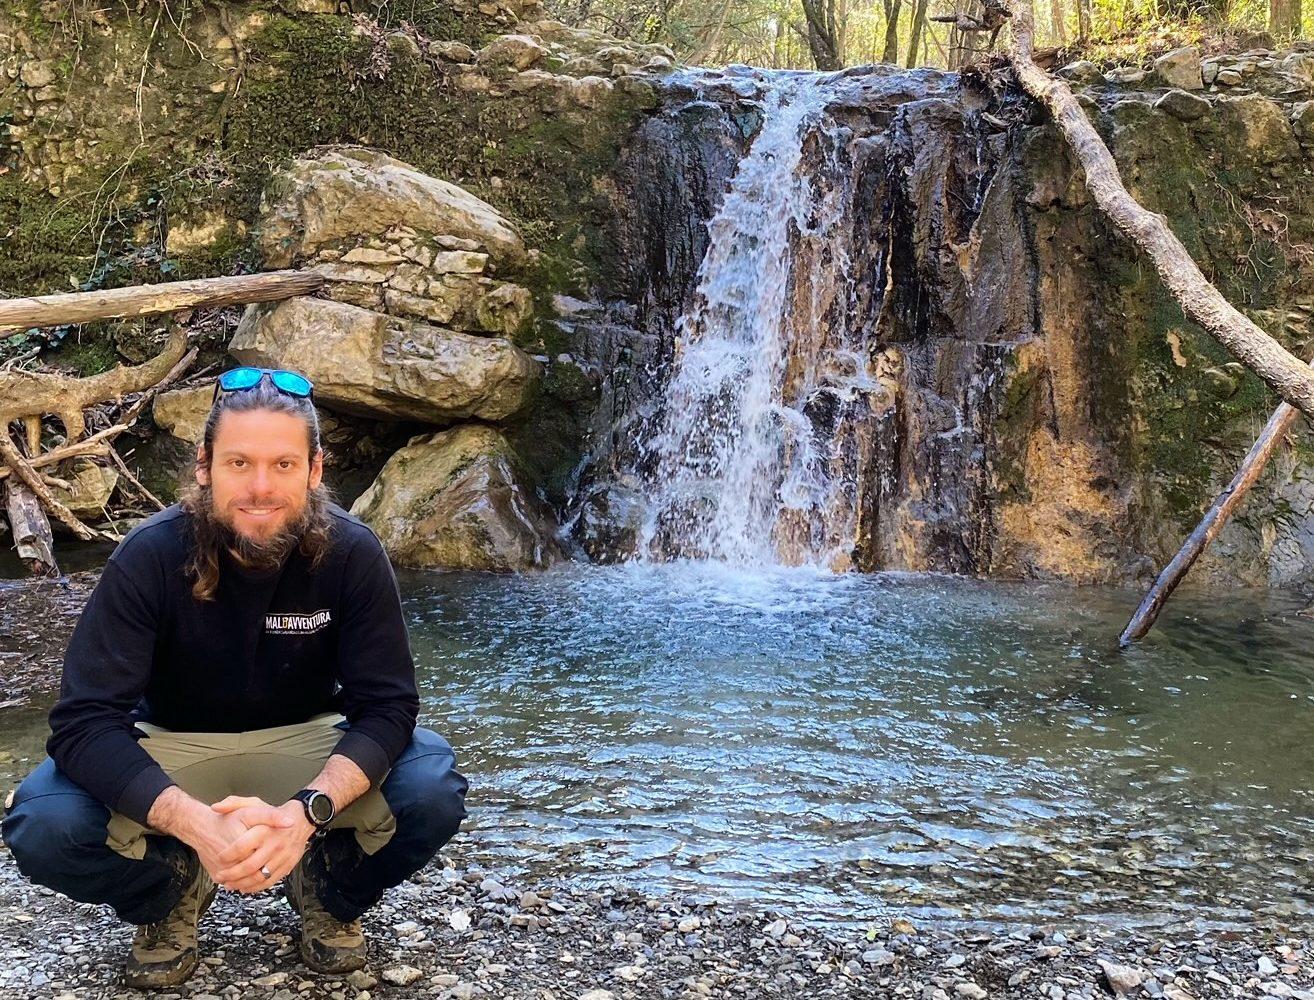 Giuseppe Gaimari la guida del weekend in trekking alla scoperta delle Colline livornesi